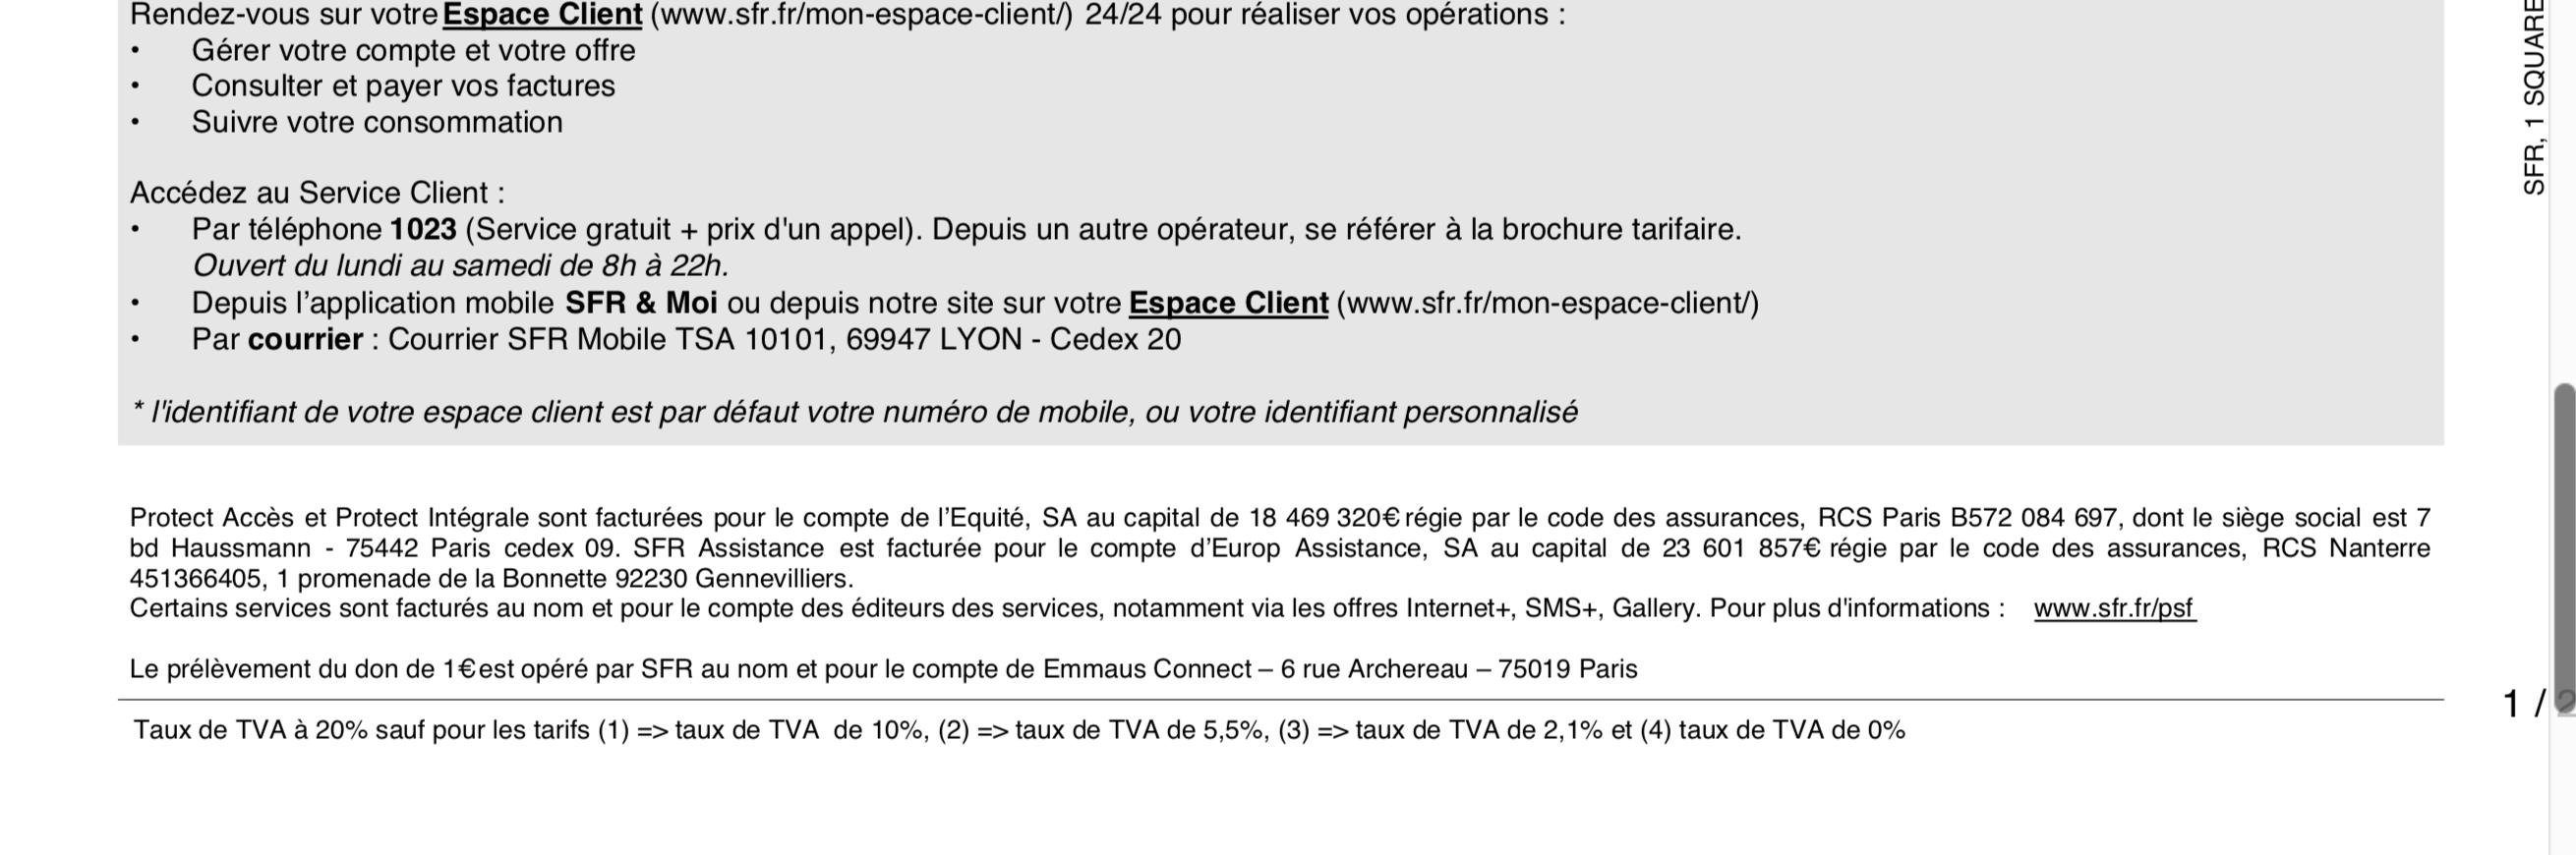 Resolu Adresse Pour Resiliation Sfr Mobile Le Forum Sfr 2003047